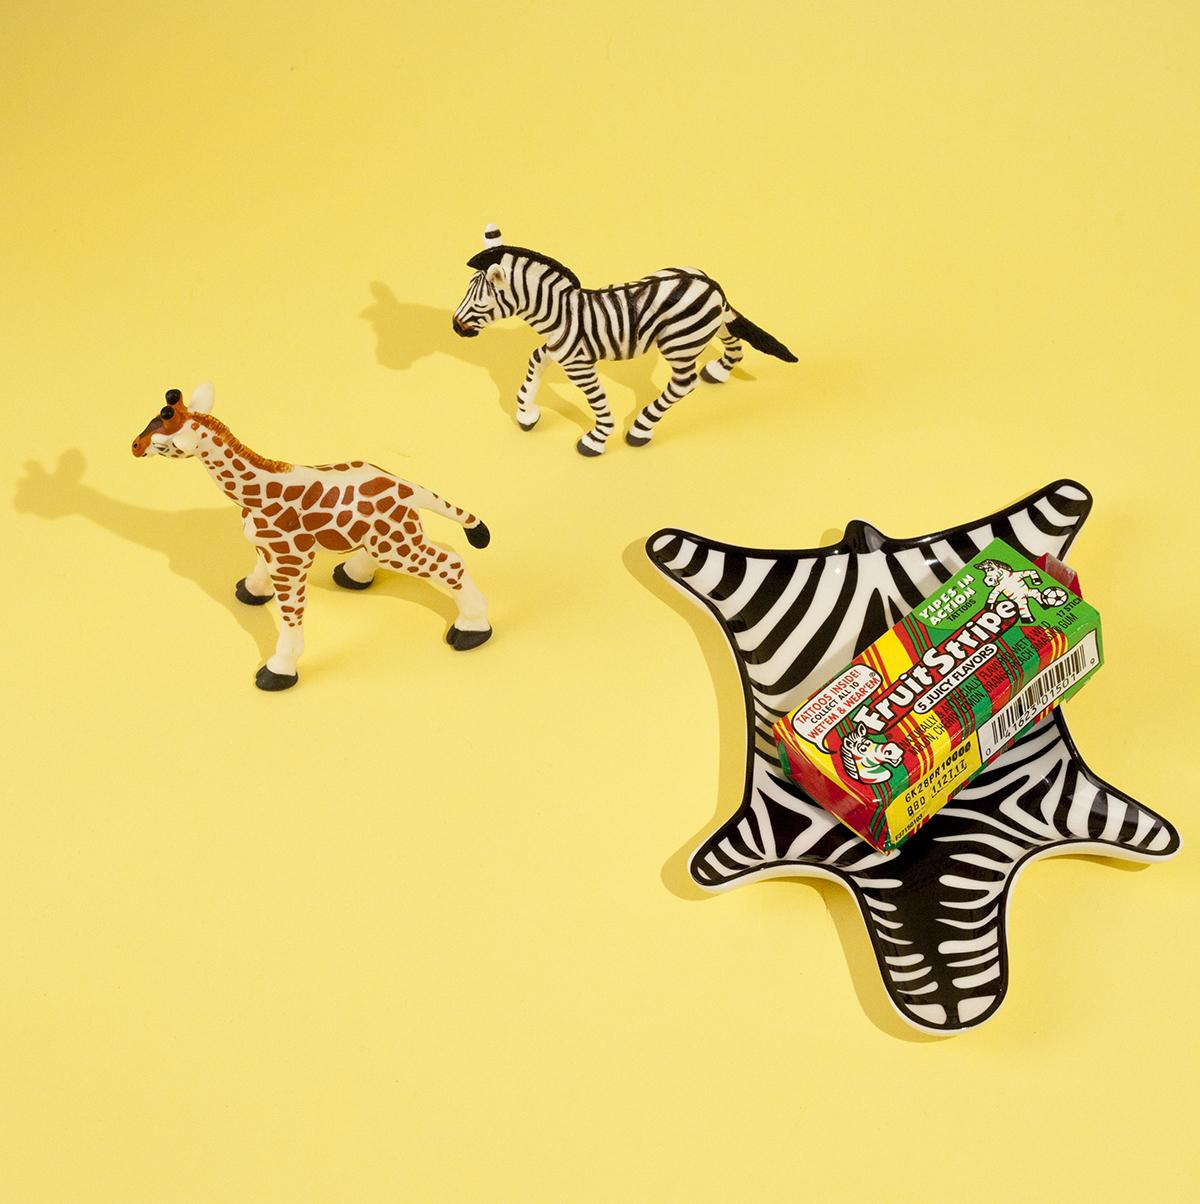 market report animal accessories man repeller-3 copy 3_insta sq